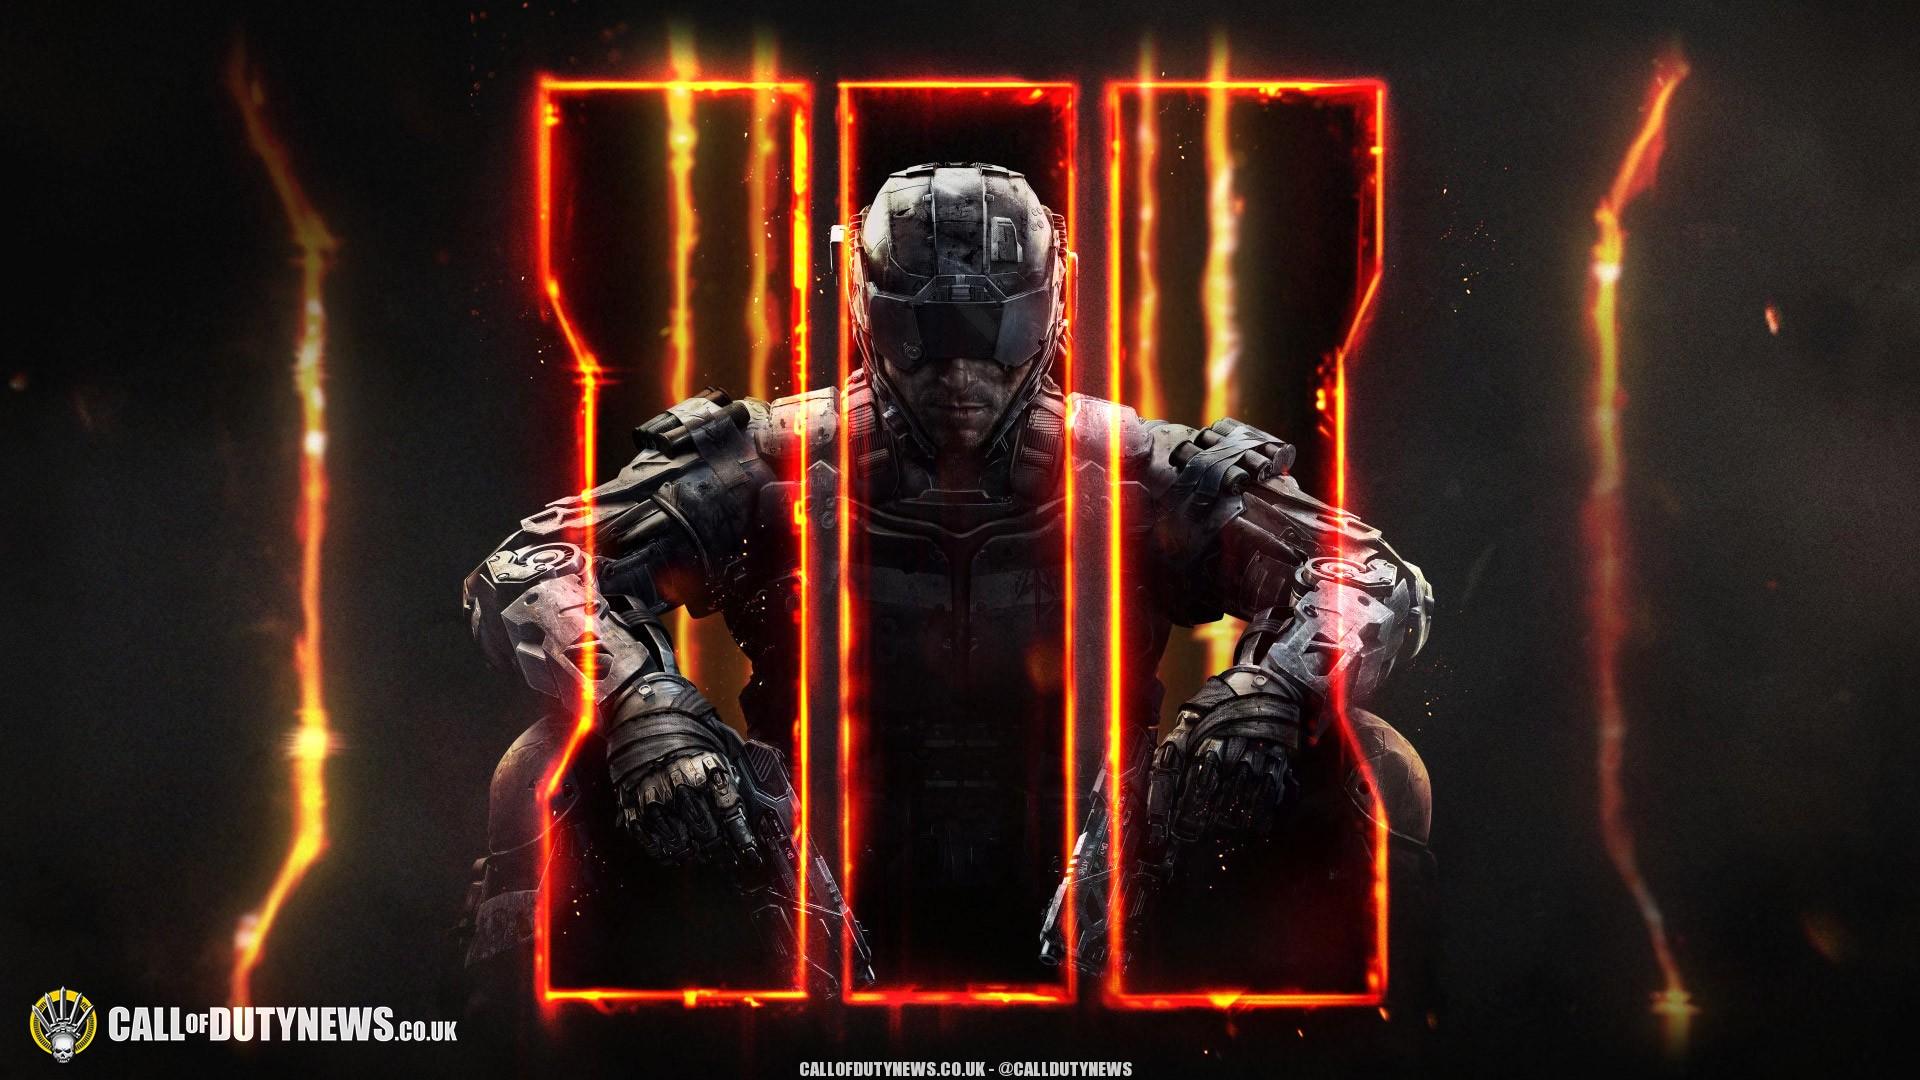 black ops 3 bo3 wallpaper 2 Call of Duty Blog 1920x1080